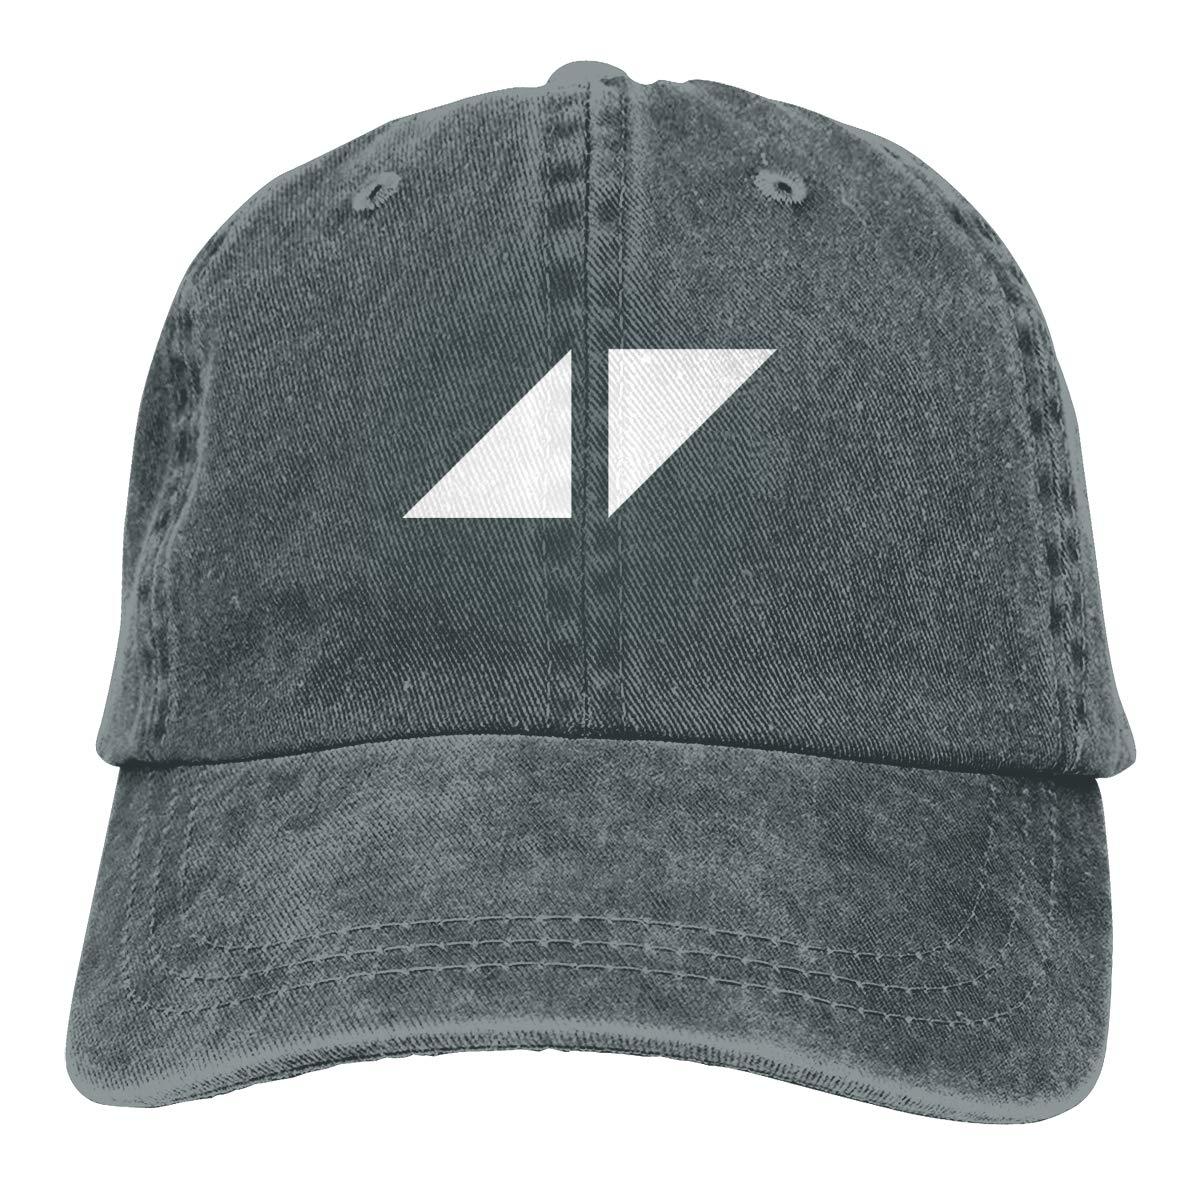 DIY Avicii Custom Fashion Baseball Hatblack